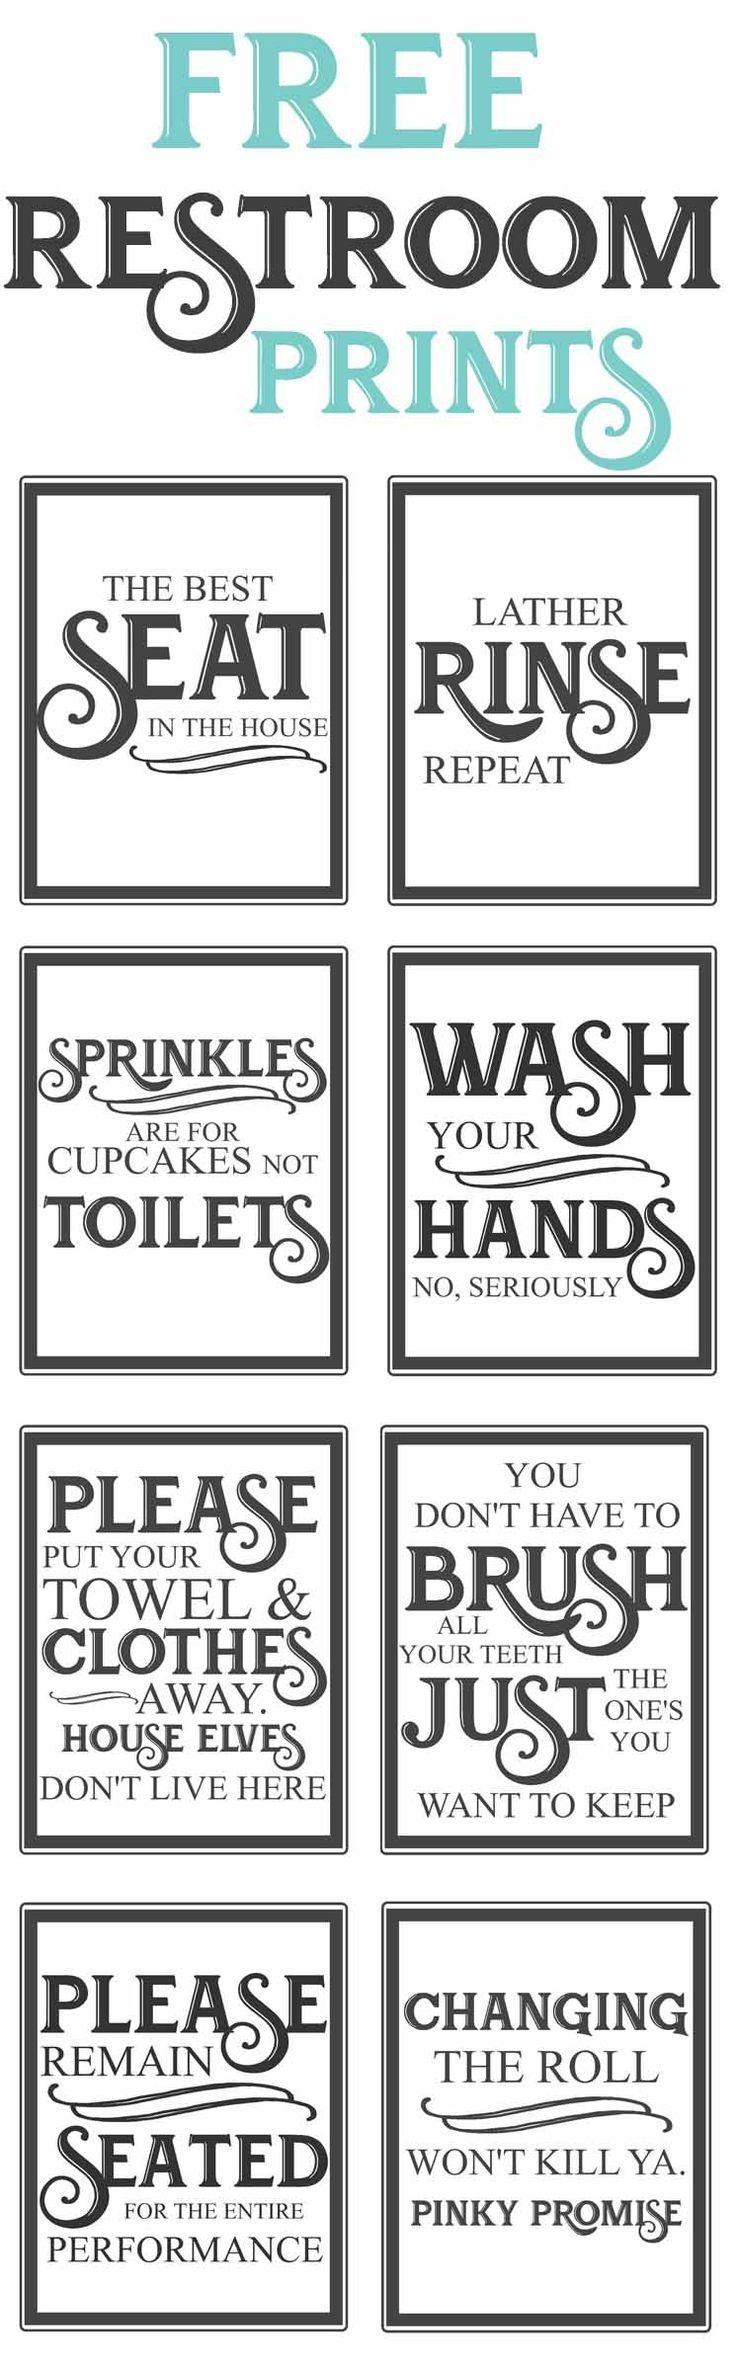 Free Vintage Bathroom Printables | Farmhouse | Diy Home Decor, Easy - Free Printable Bathroom Pictures